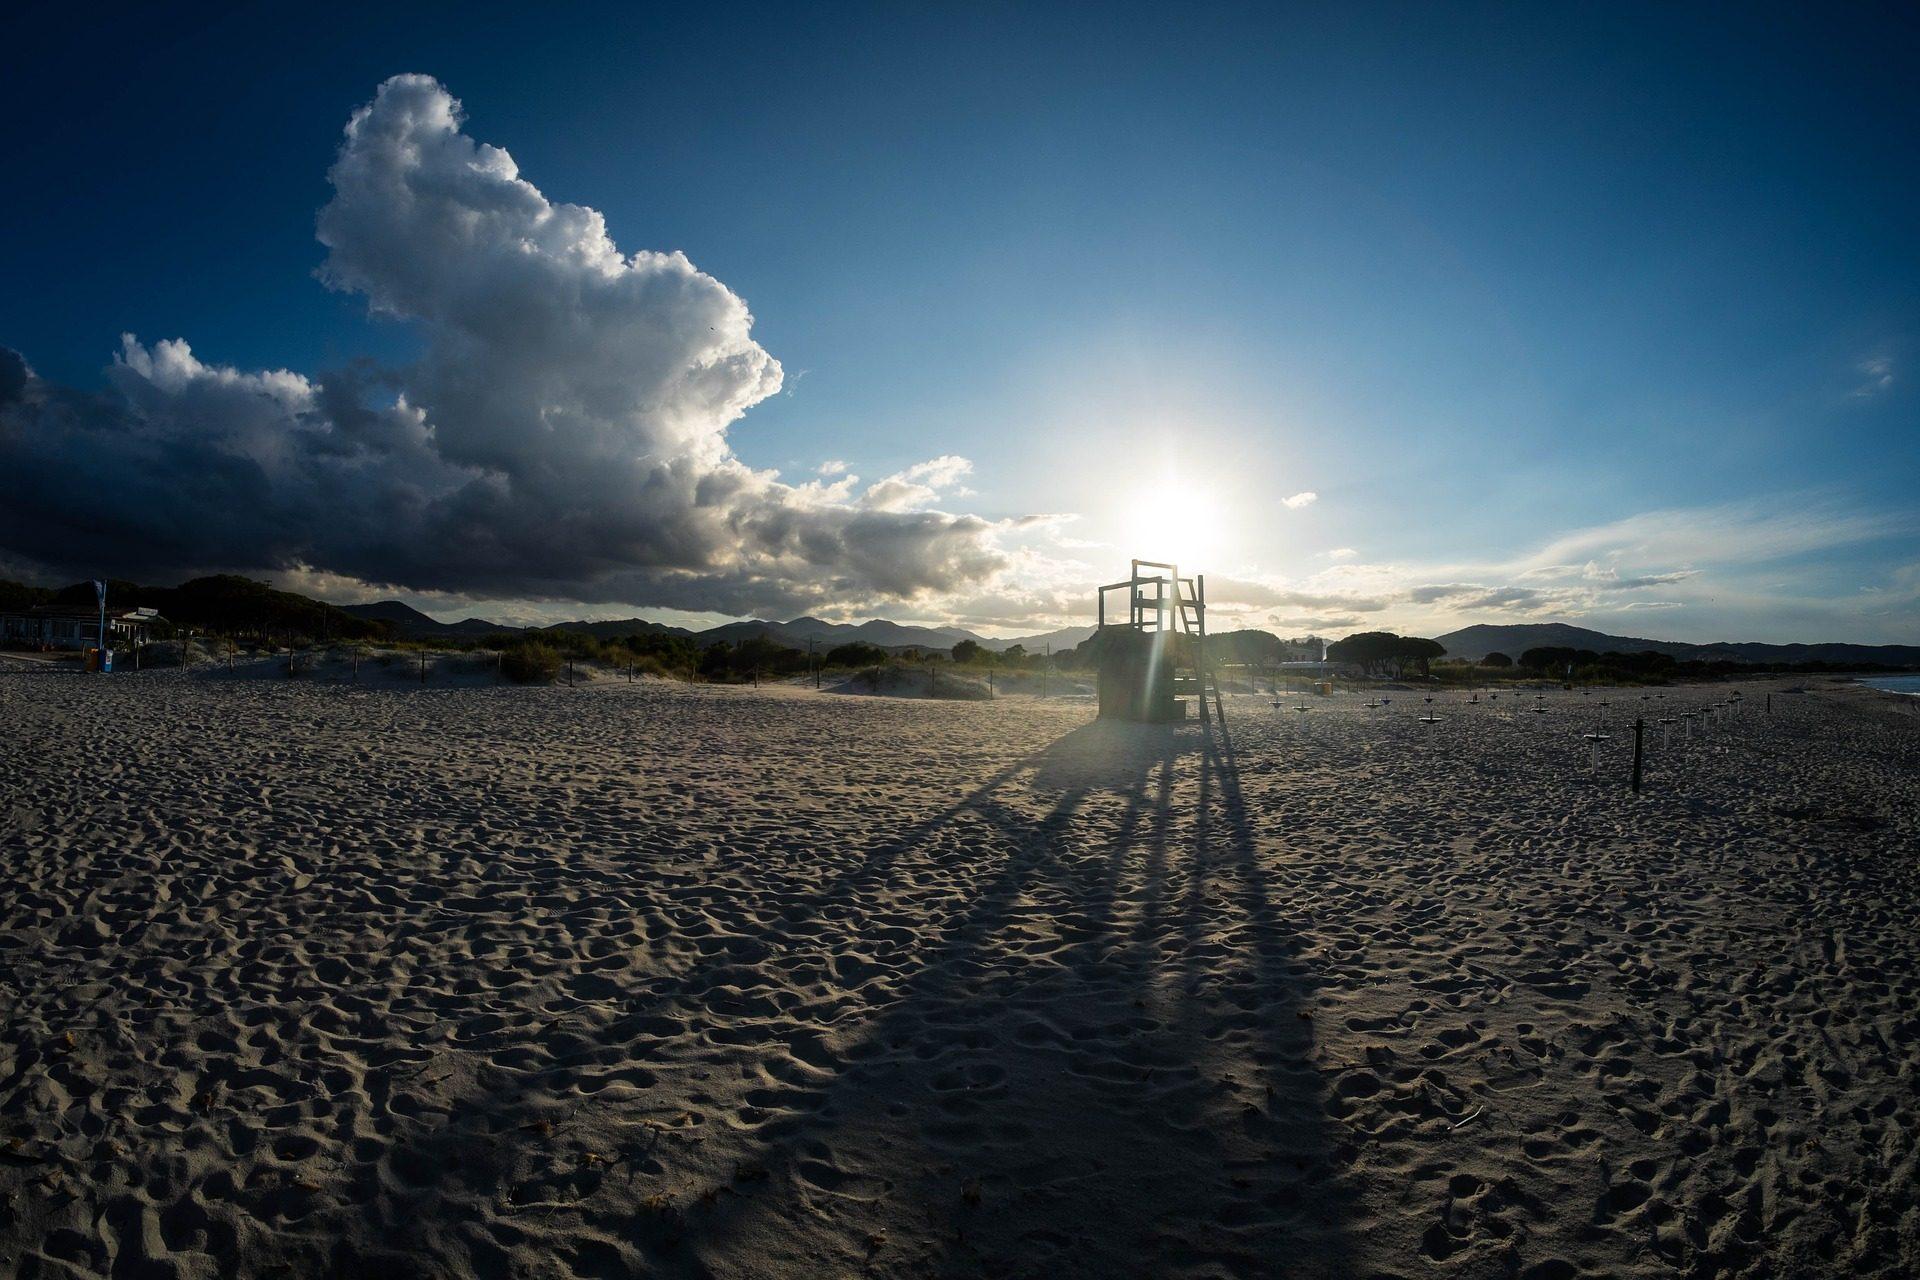 Strand, Sand, Bank, Stuhl, Himmel, Wolken - Wallpaper HD - Prof.-falken.com